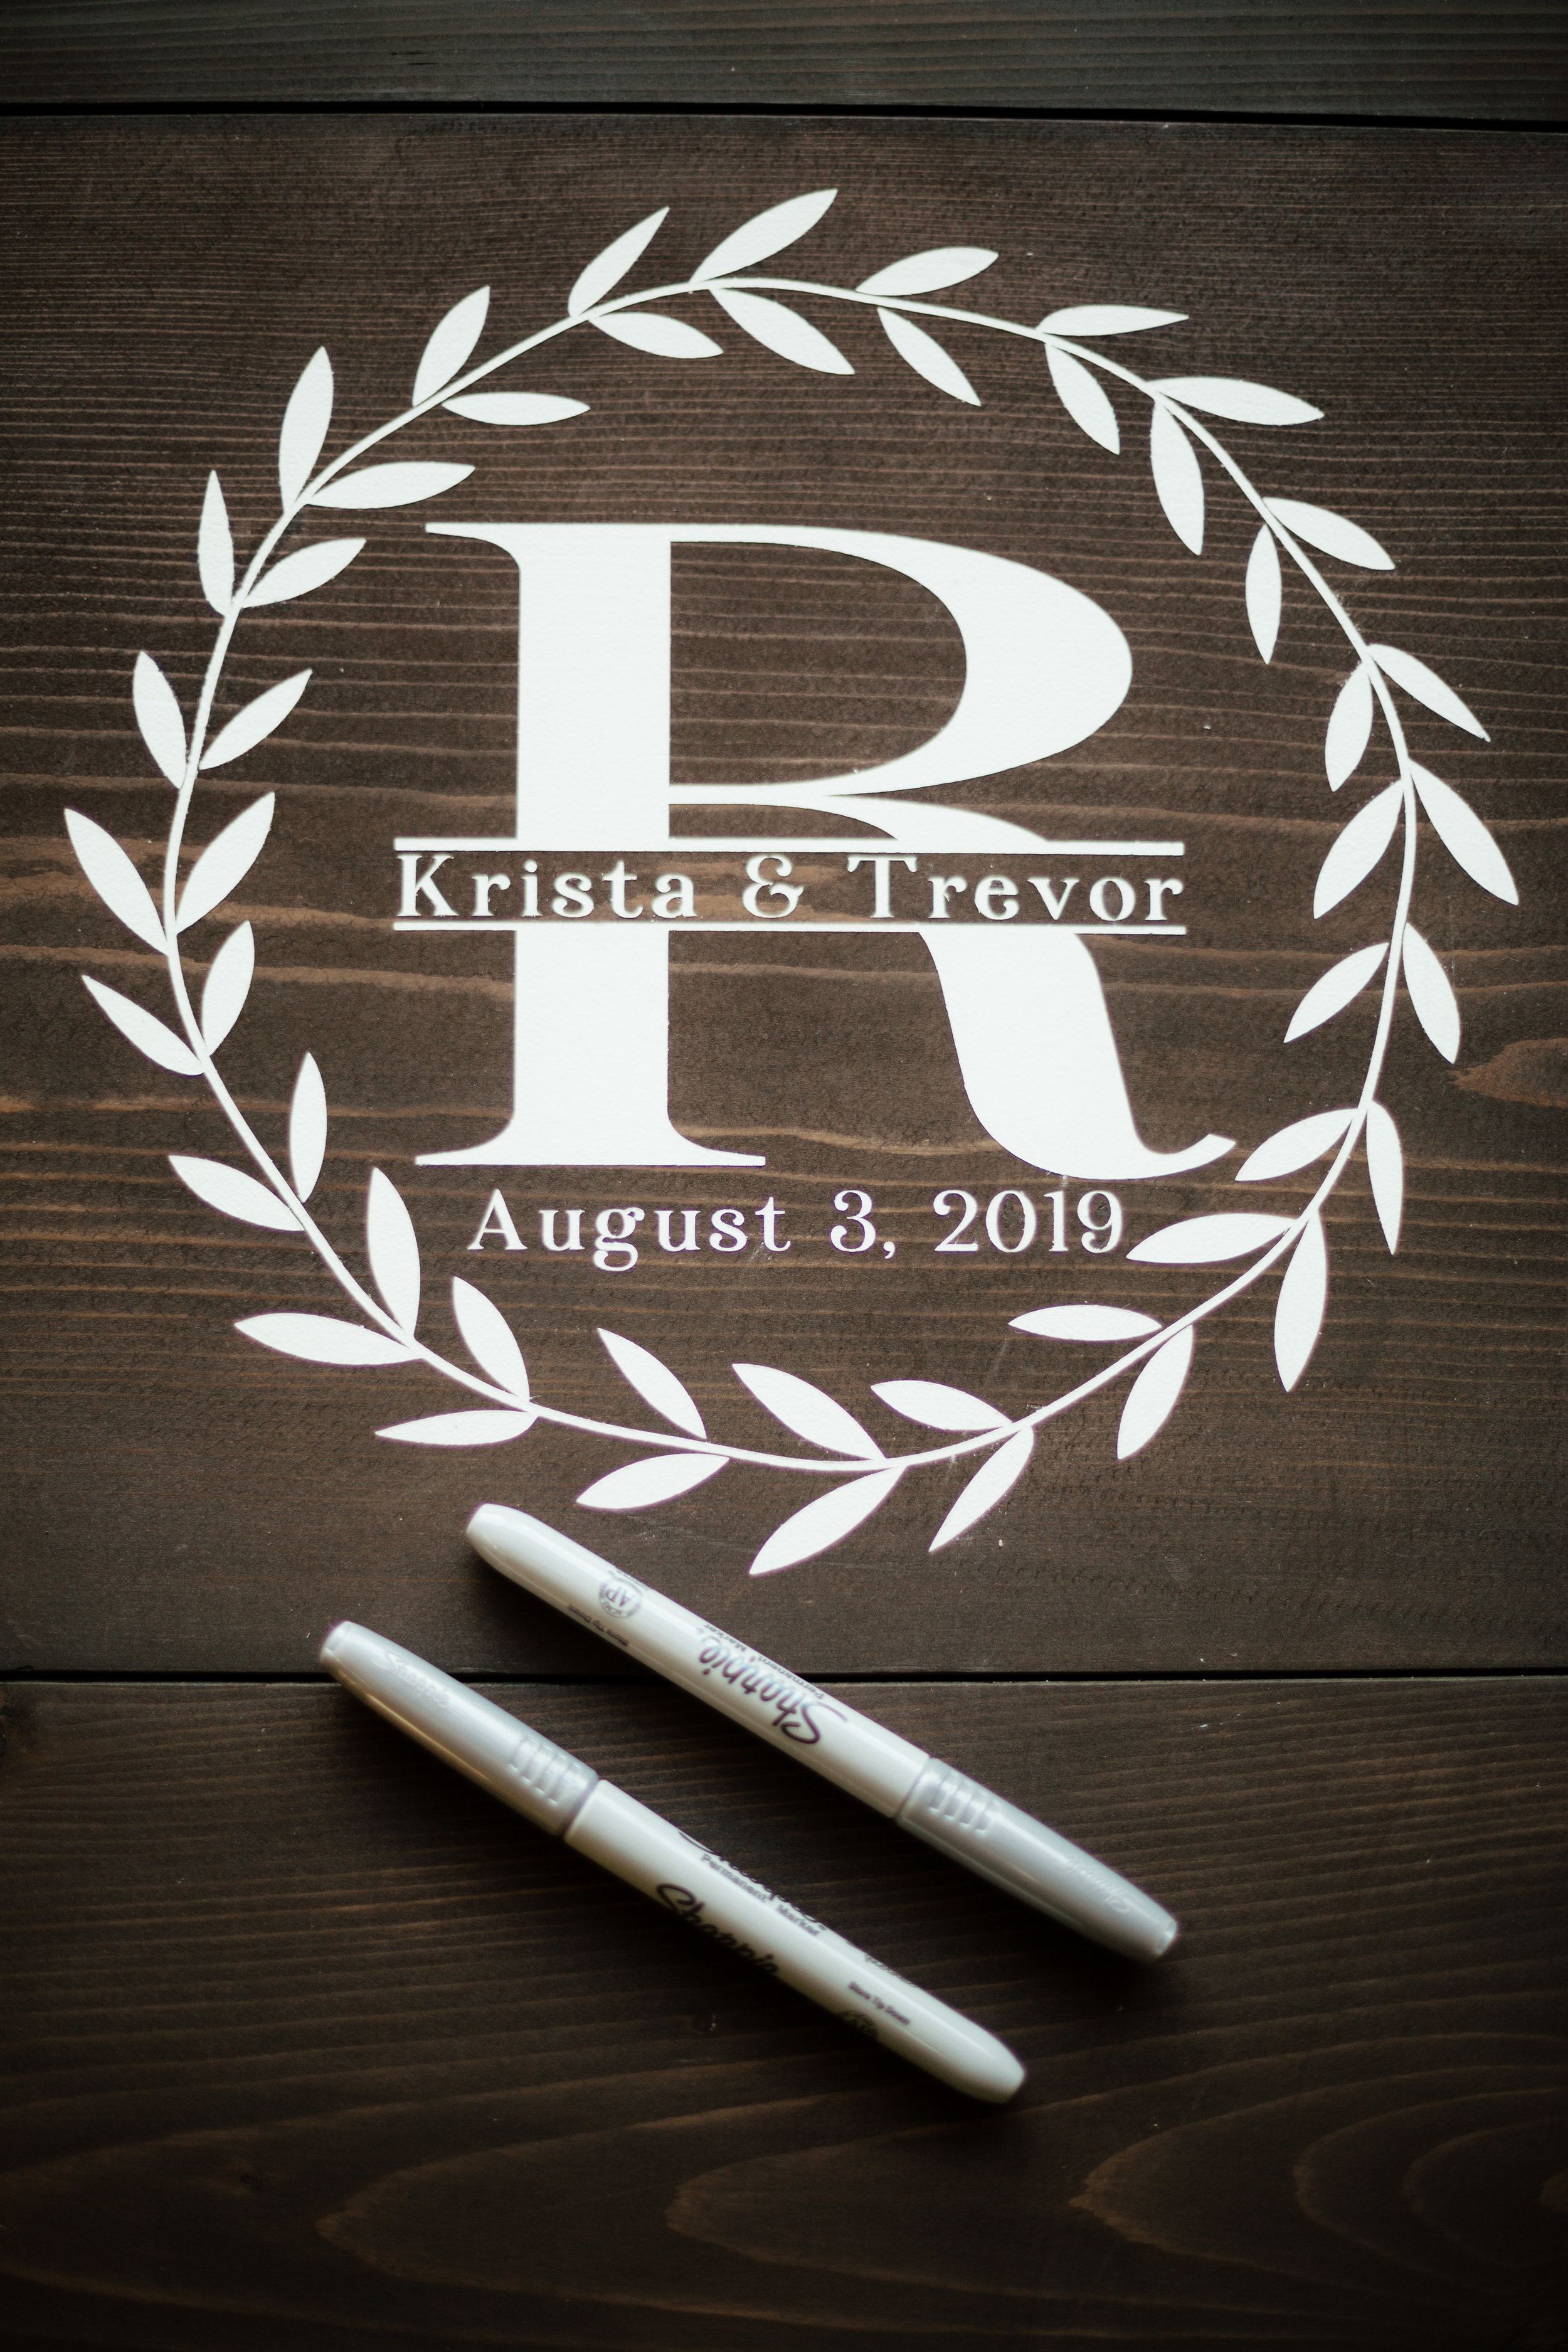 Trevor + Krista 1 - Details-27.jpg